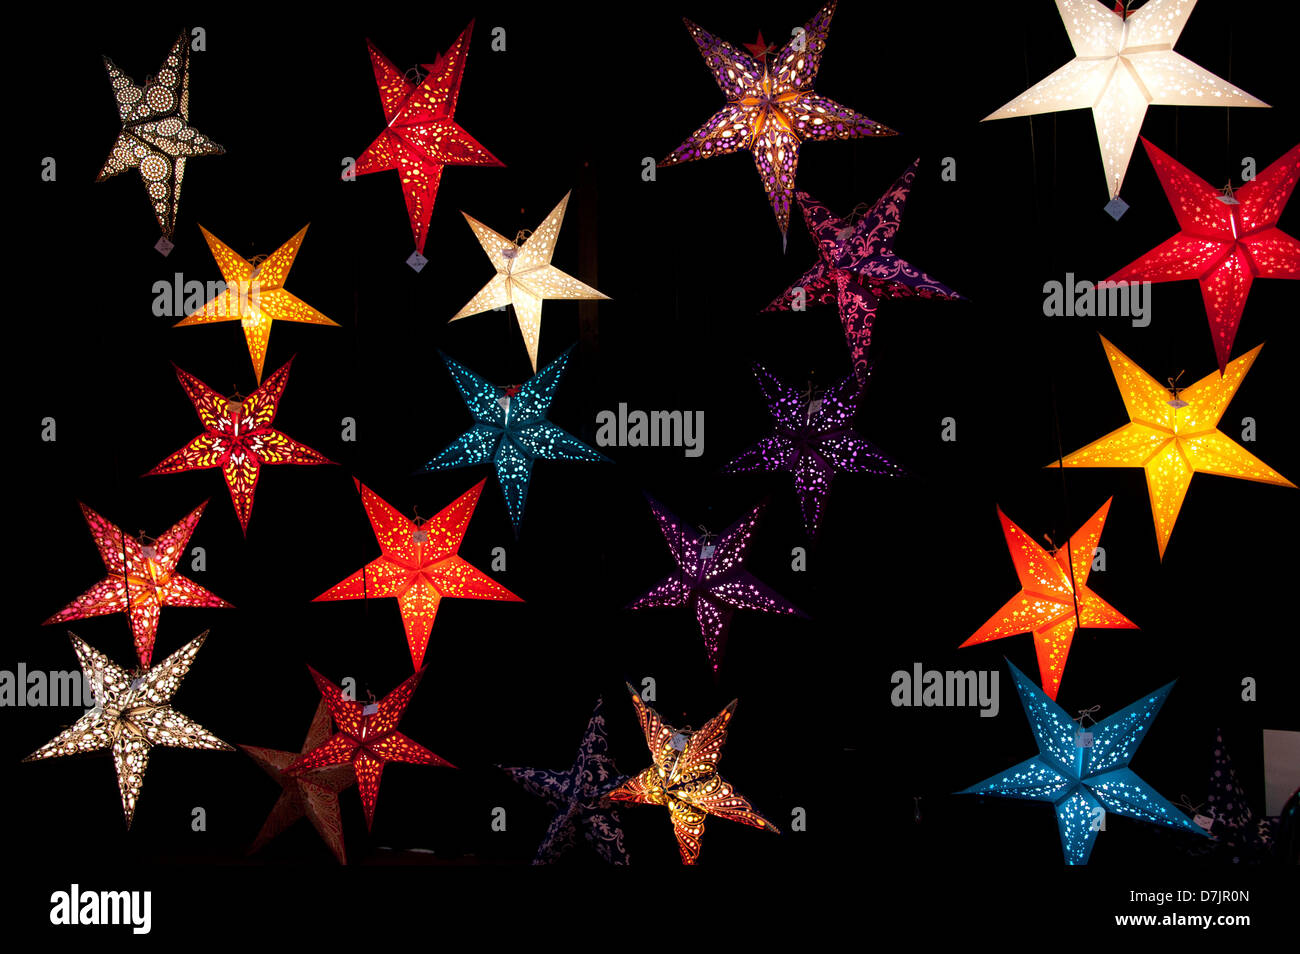 Luminous poinsettias, Leuchtende Weihnachtssterne - Stock Image